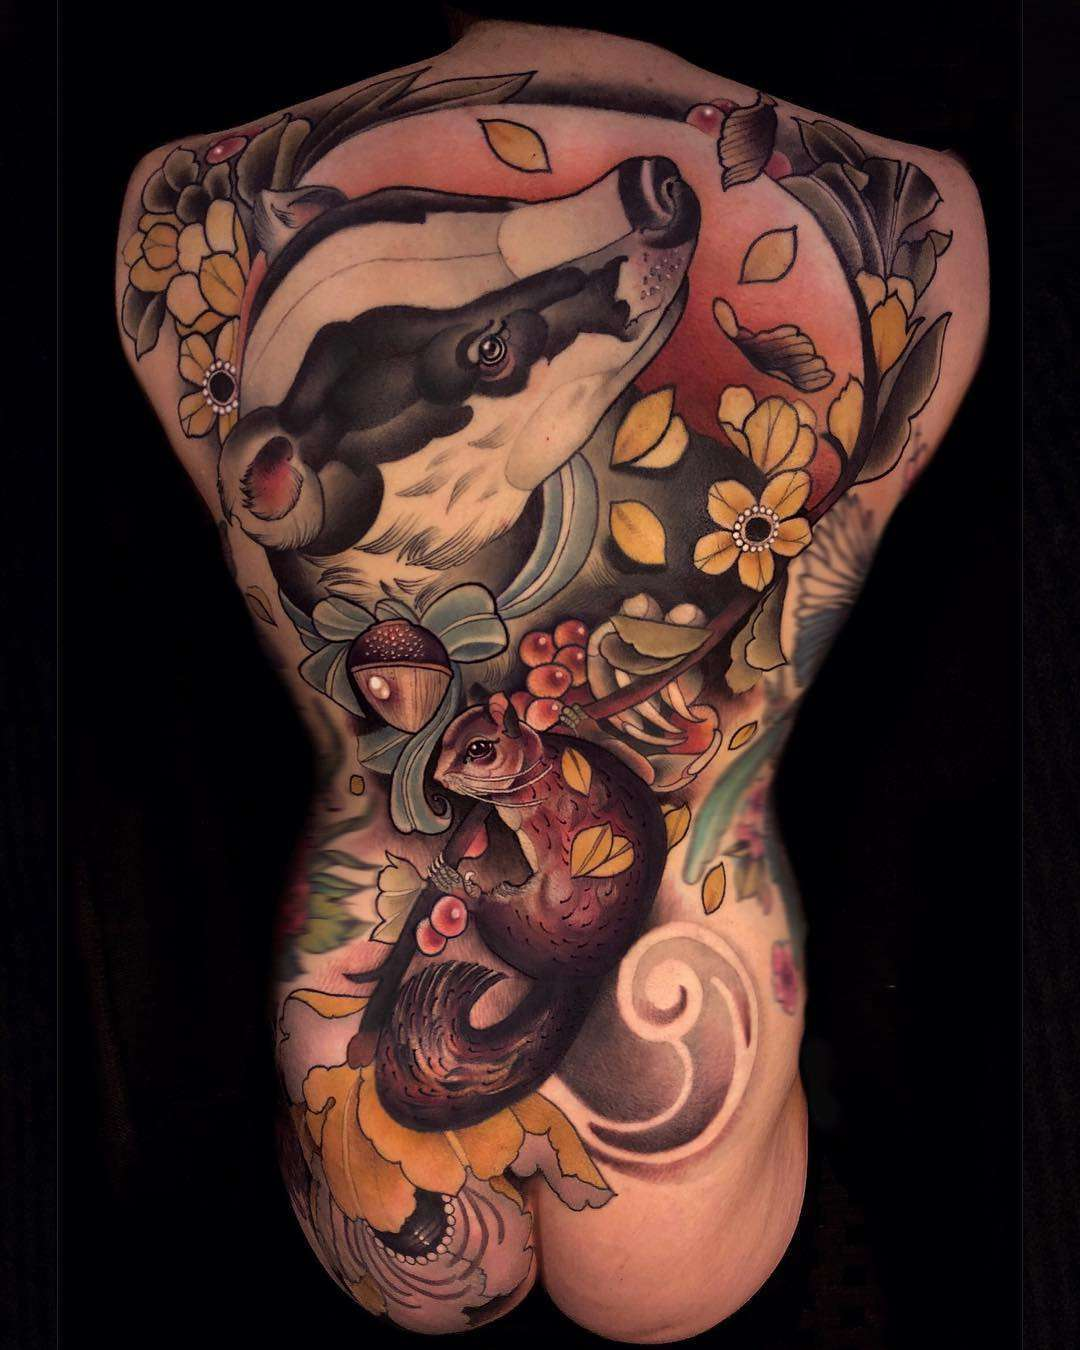 Artistic Tattoo Lille tattoo artist chris green